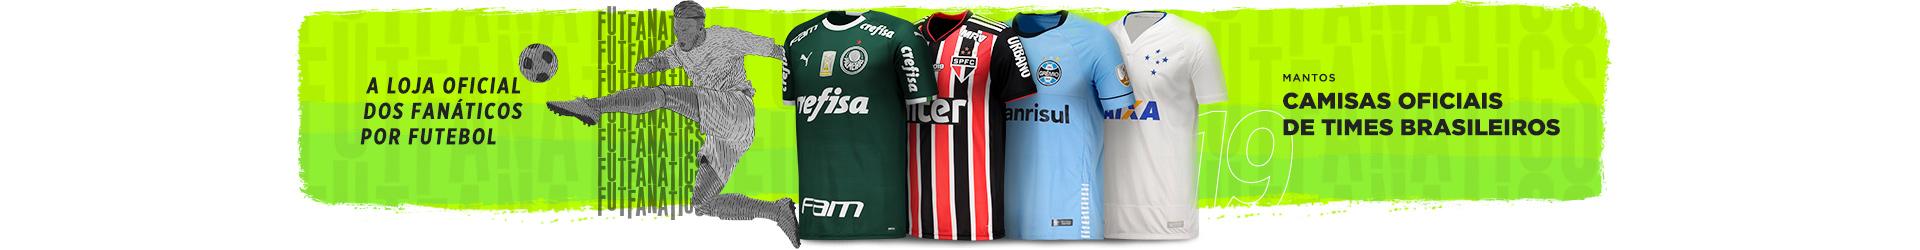 bed7bebd0c369 Camisas de Futebol do Londrina Esporte Clube - FutFanatics